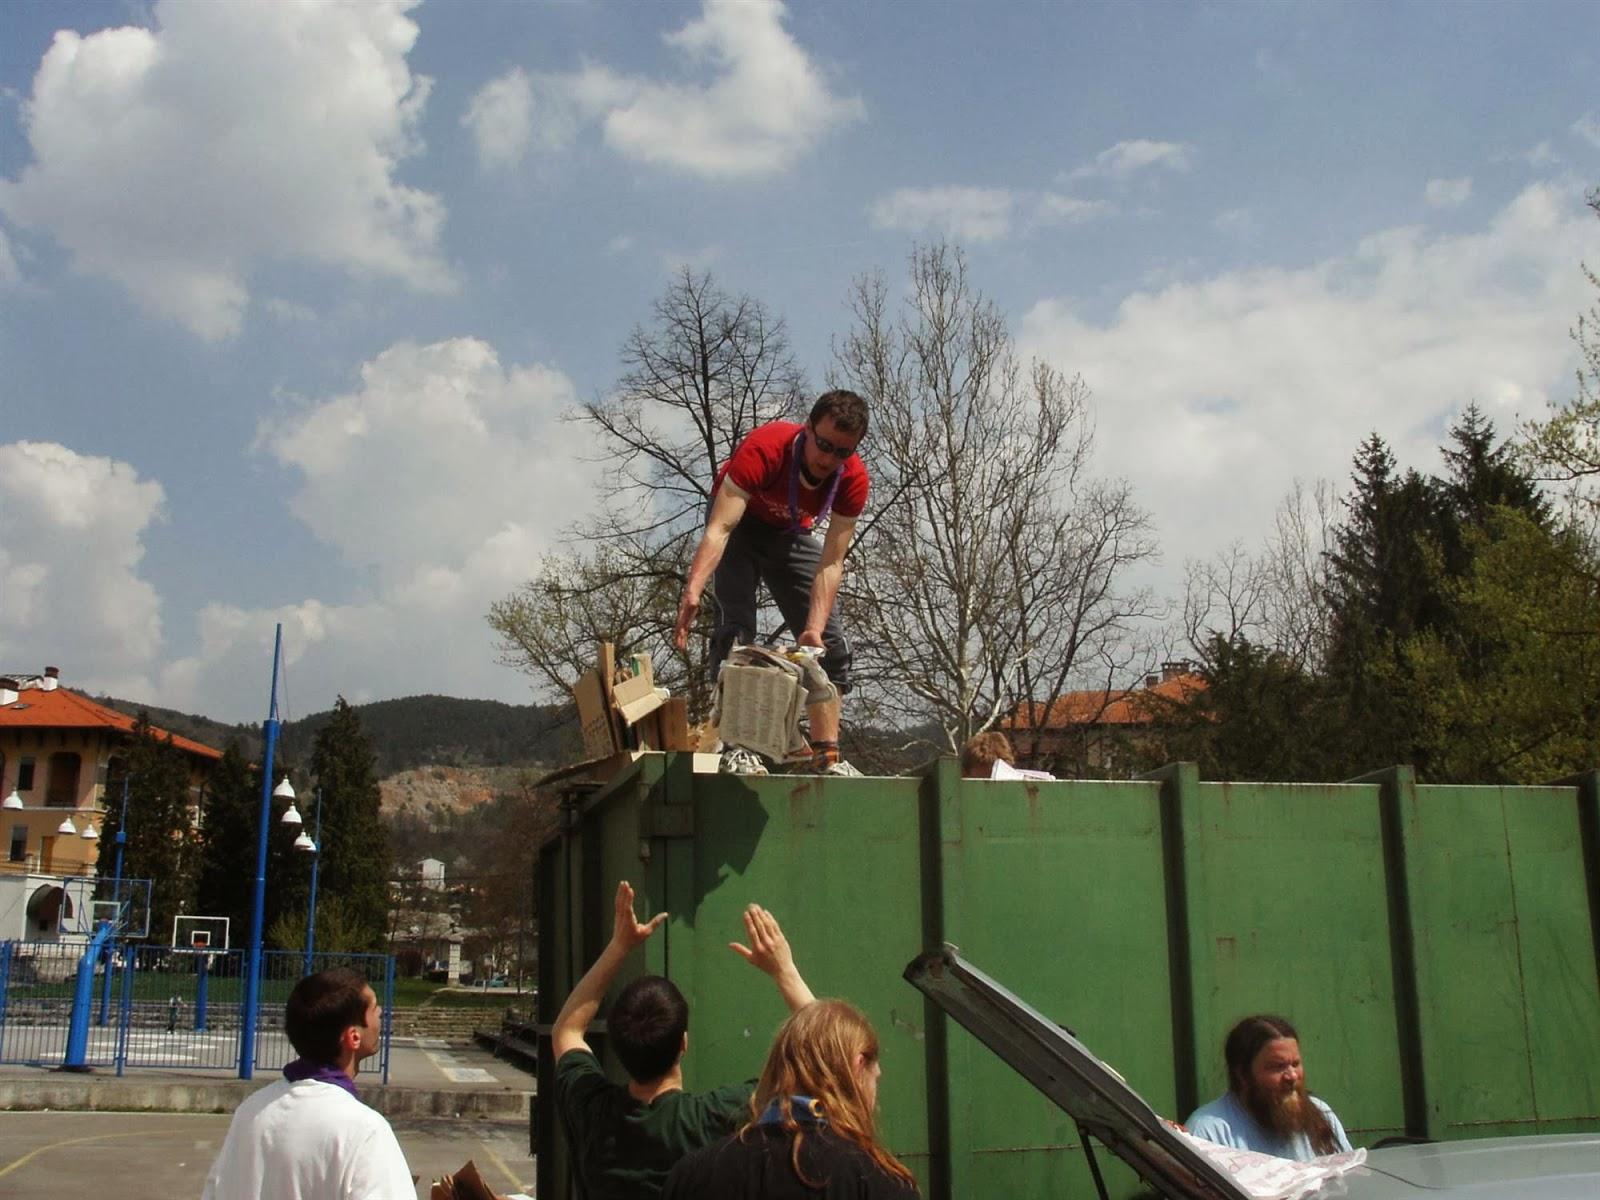 Zbiranje papirja, Ilirska Bistrica 2006 - KIF_8443.JPG